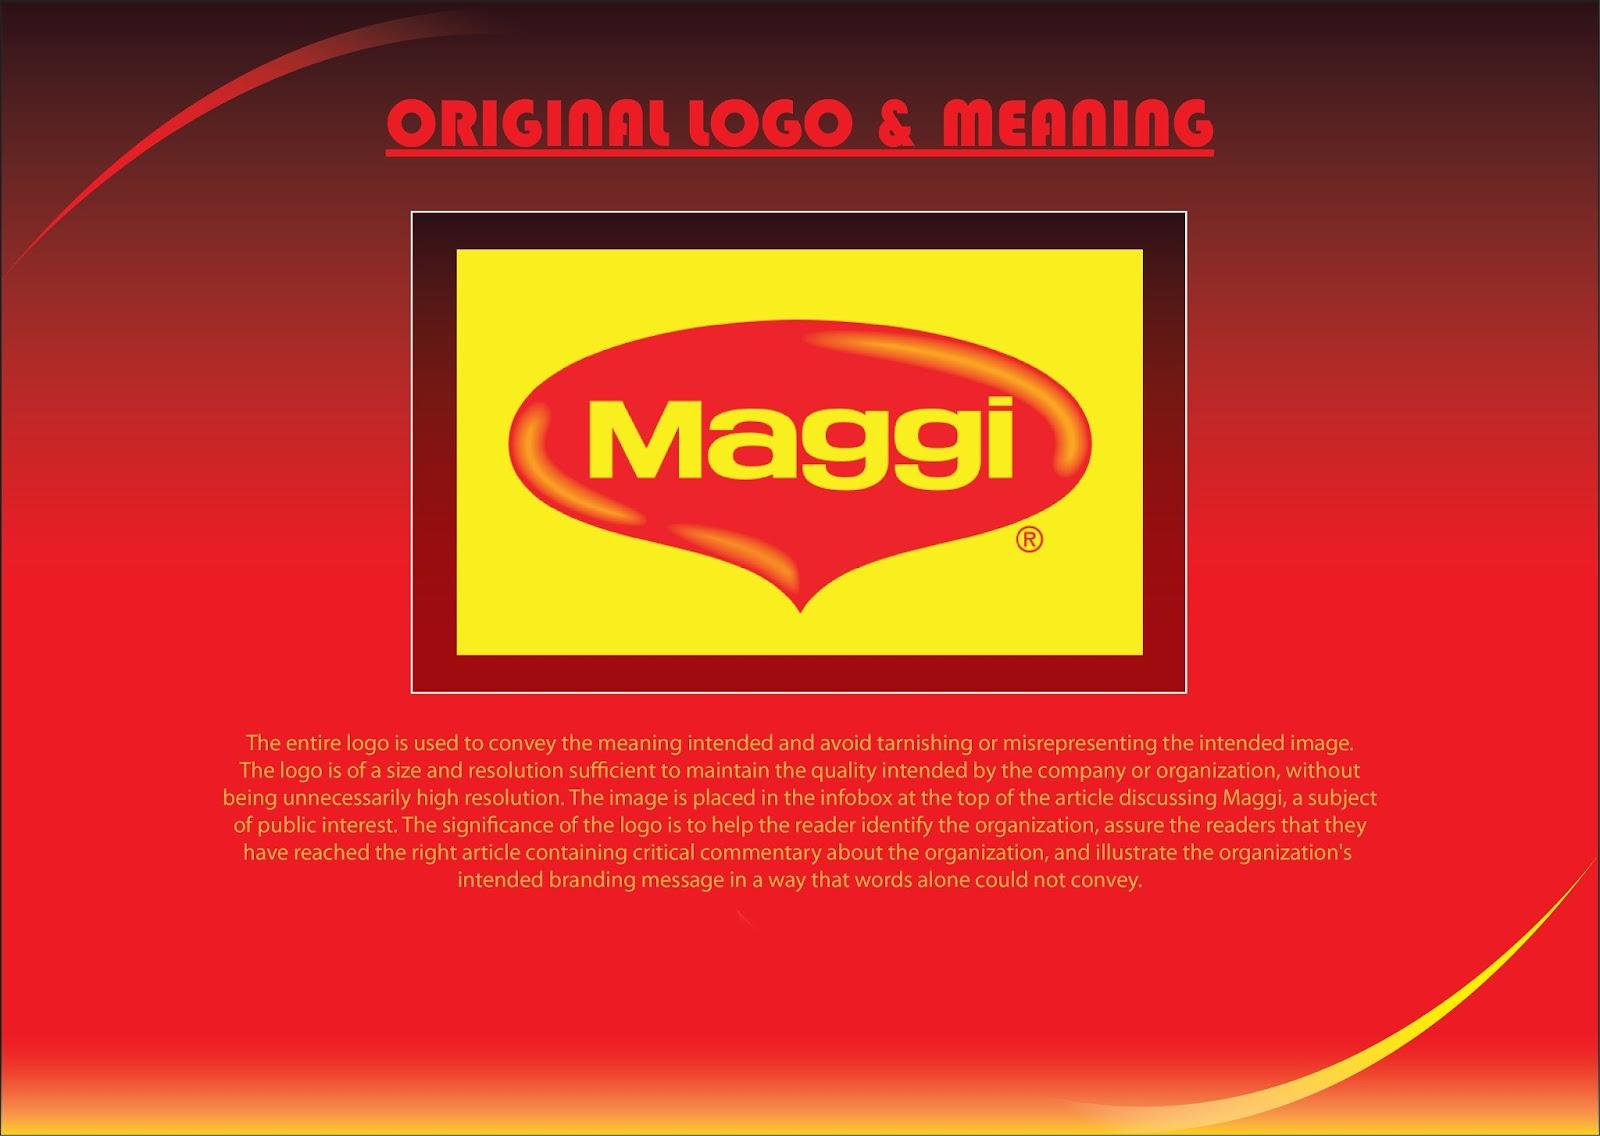 Subhajit Bhattacharjee: RECREATED MAGGI LOGO FROM ORIGINAL LOGO BY ... | {Maggi logo 21}